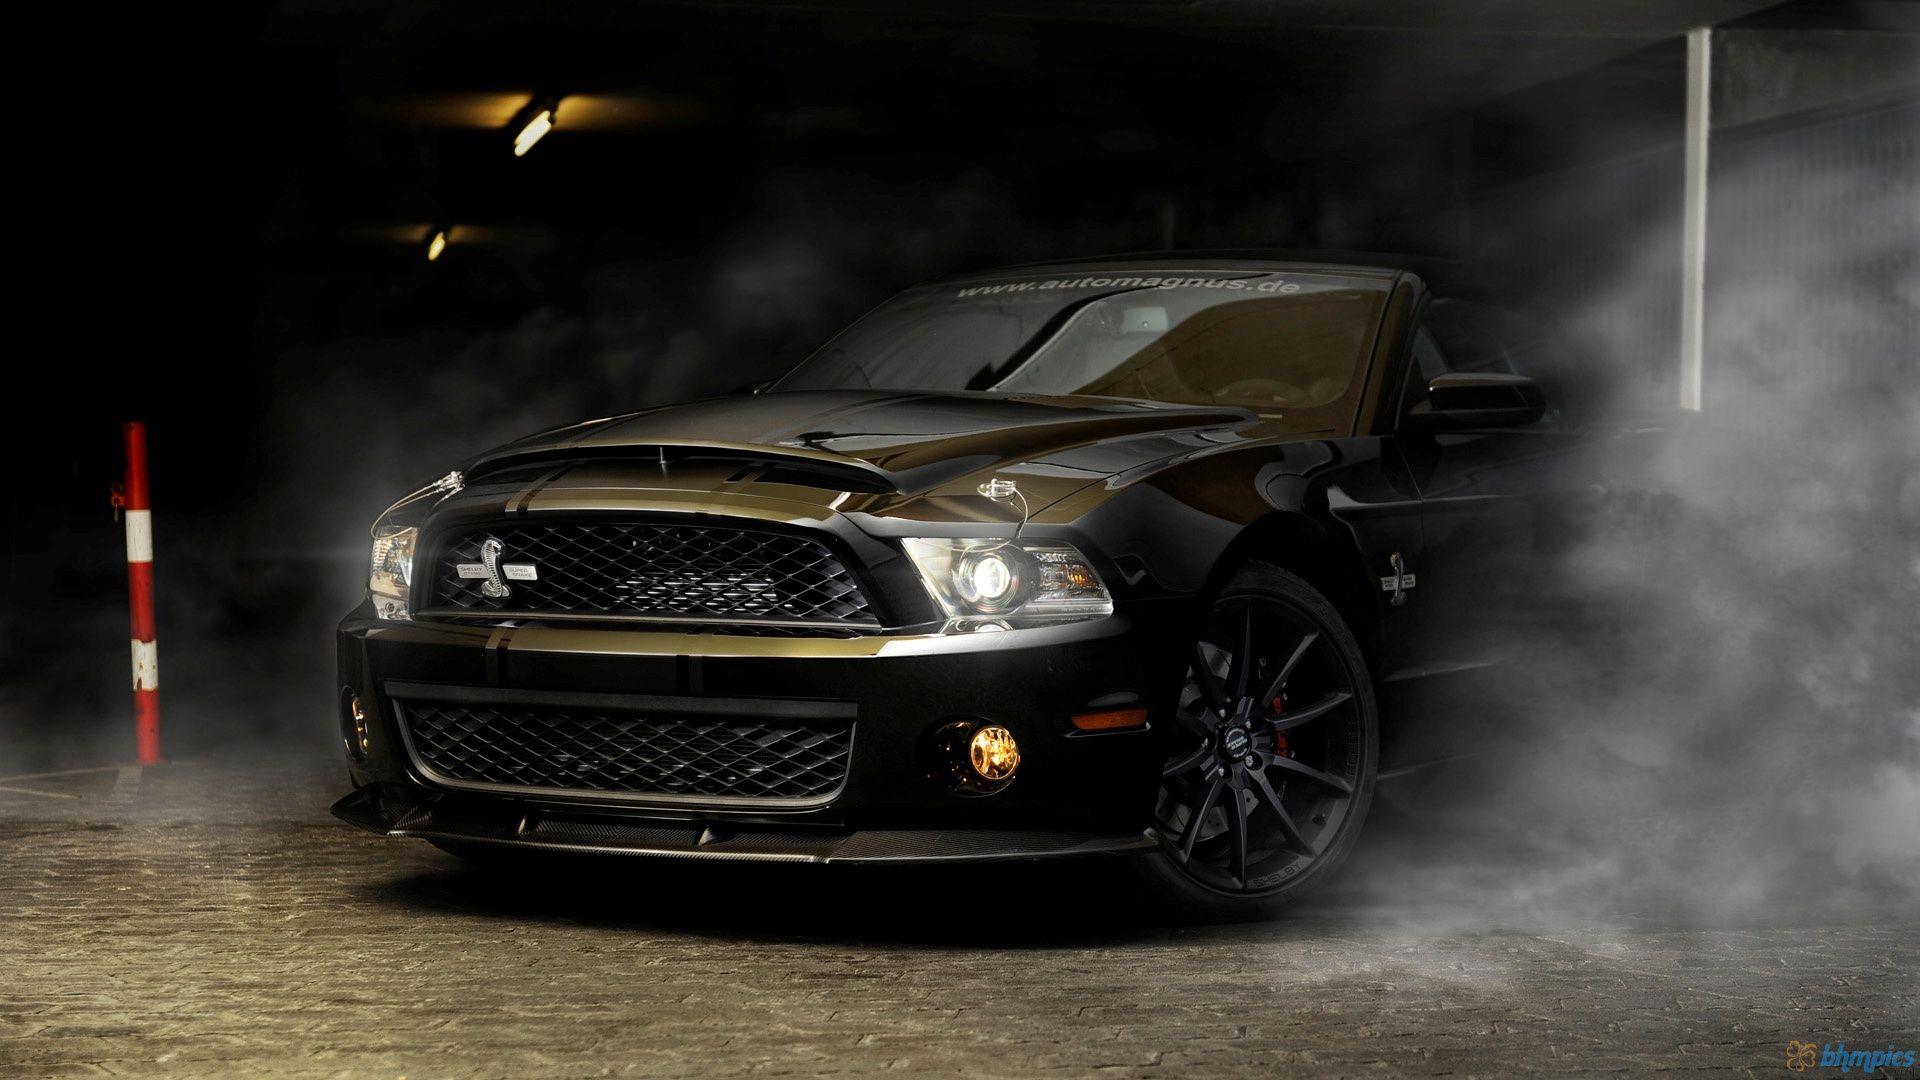 Black Ford Mustang Gt500 Super Snake Wallpaper